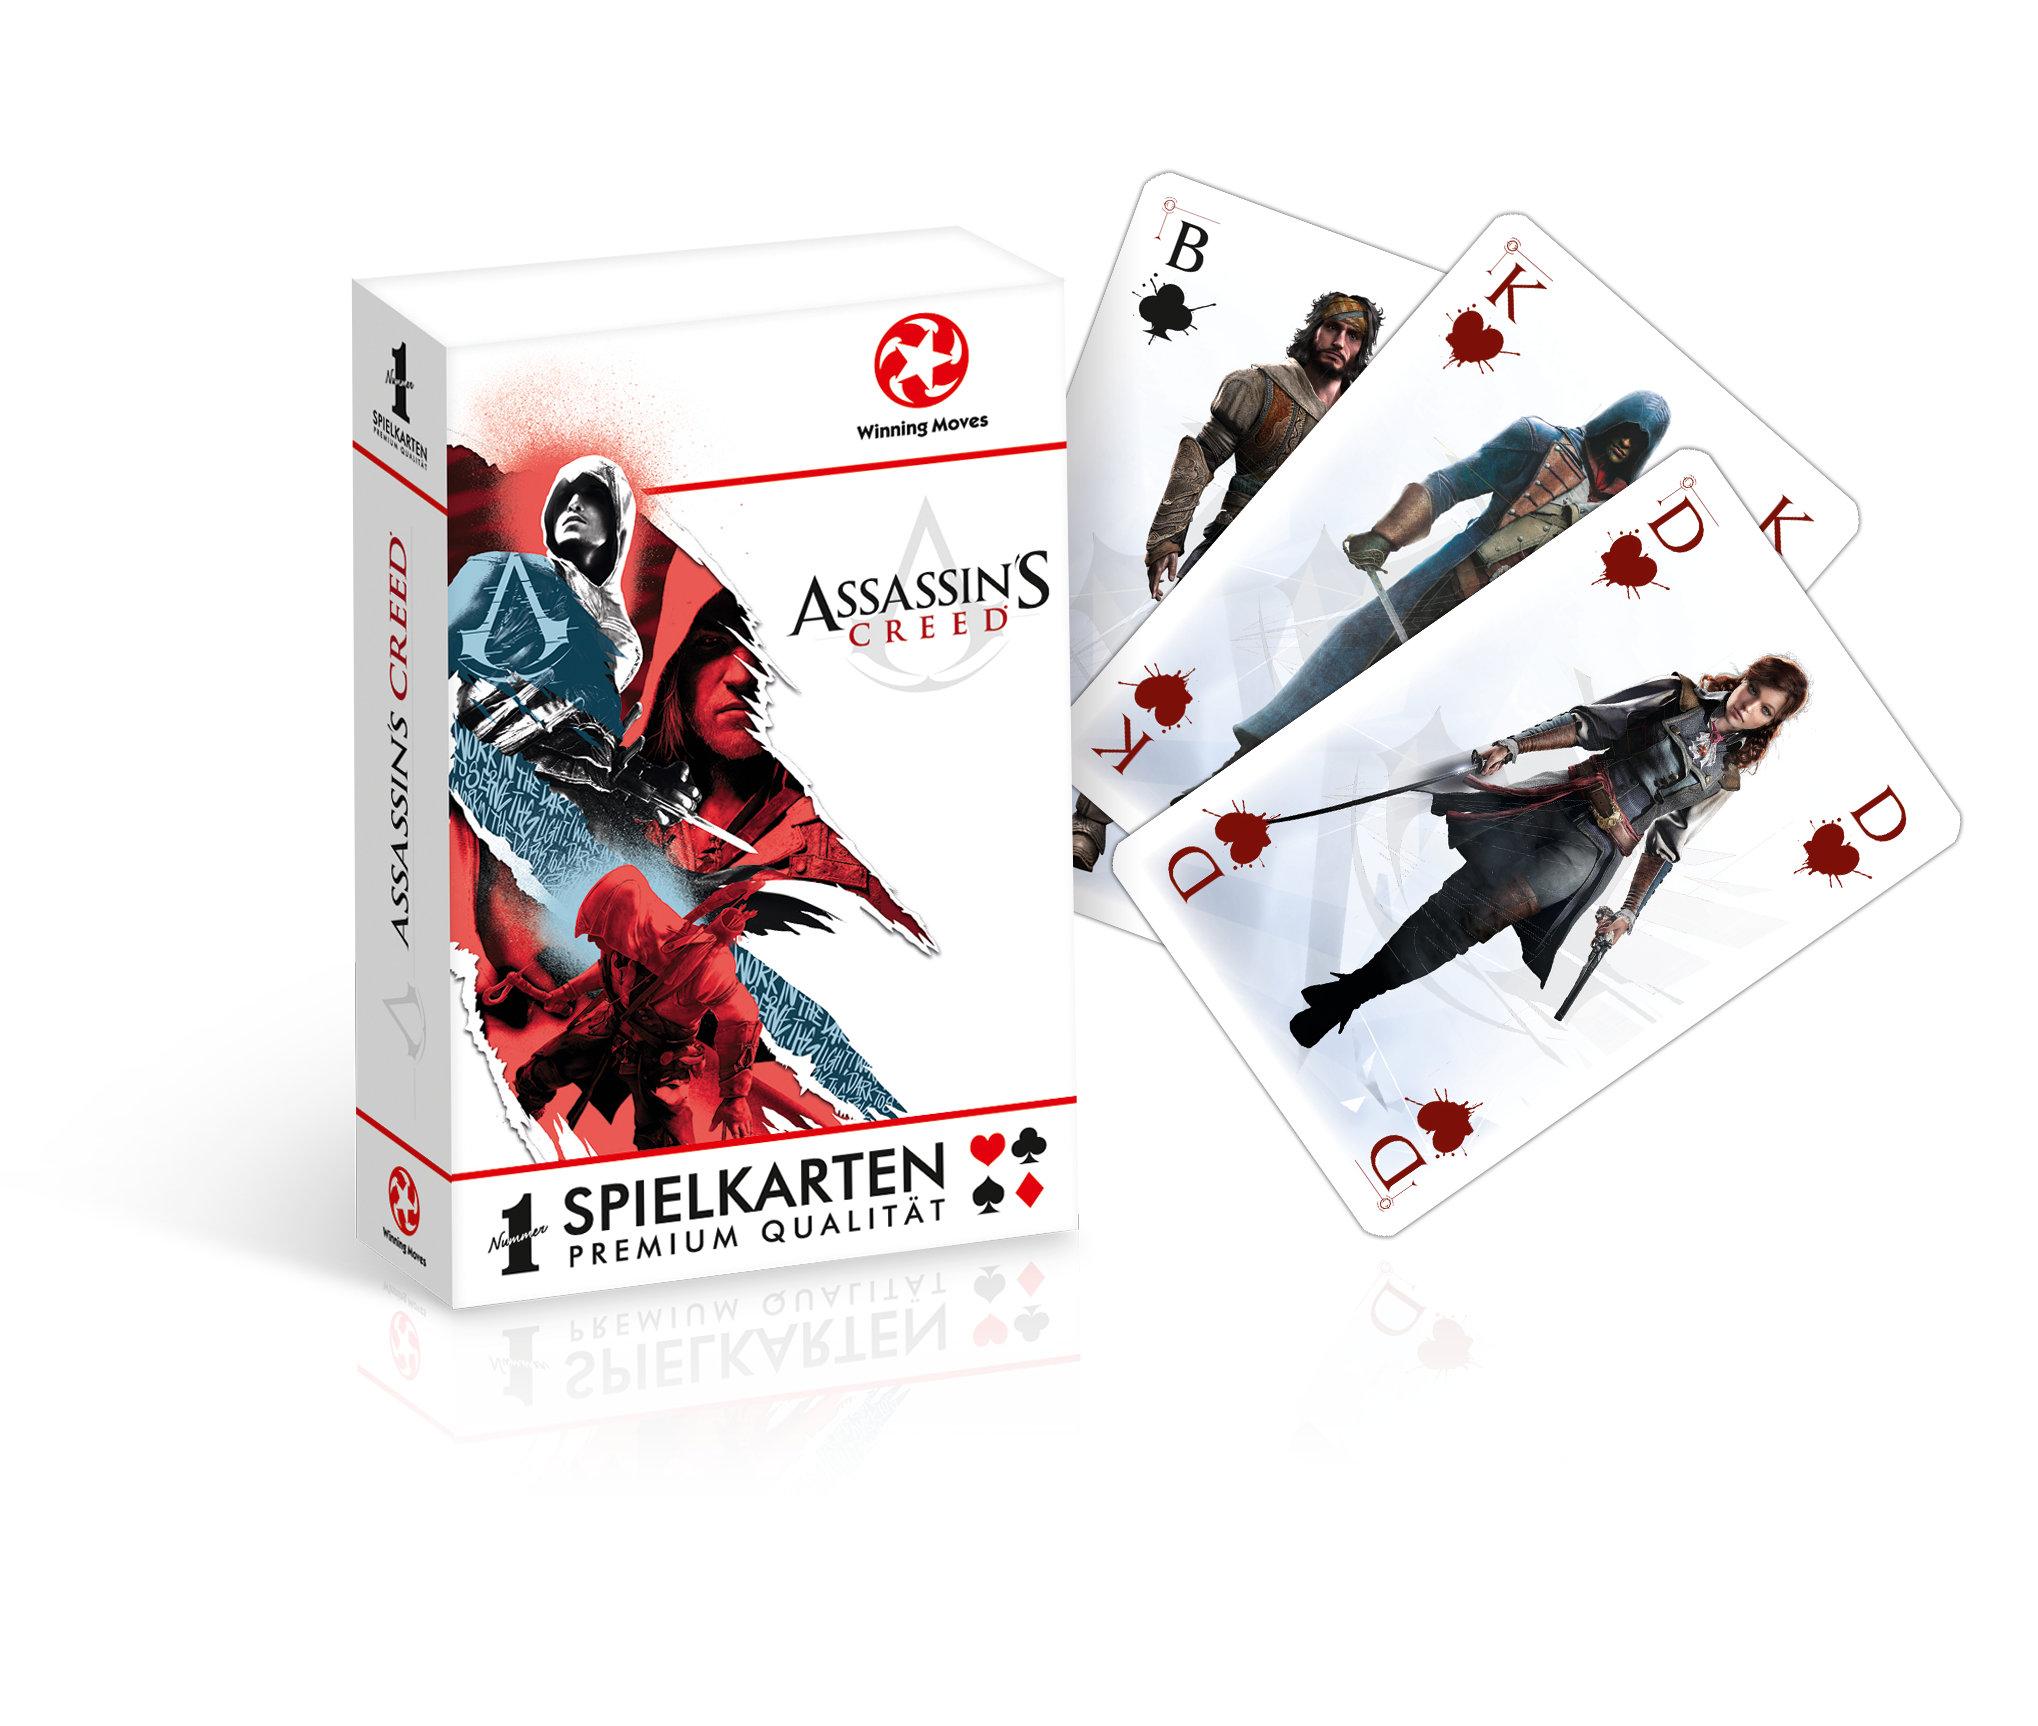 Assassin's Creed Spielkarten